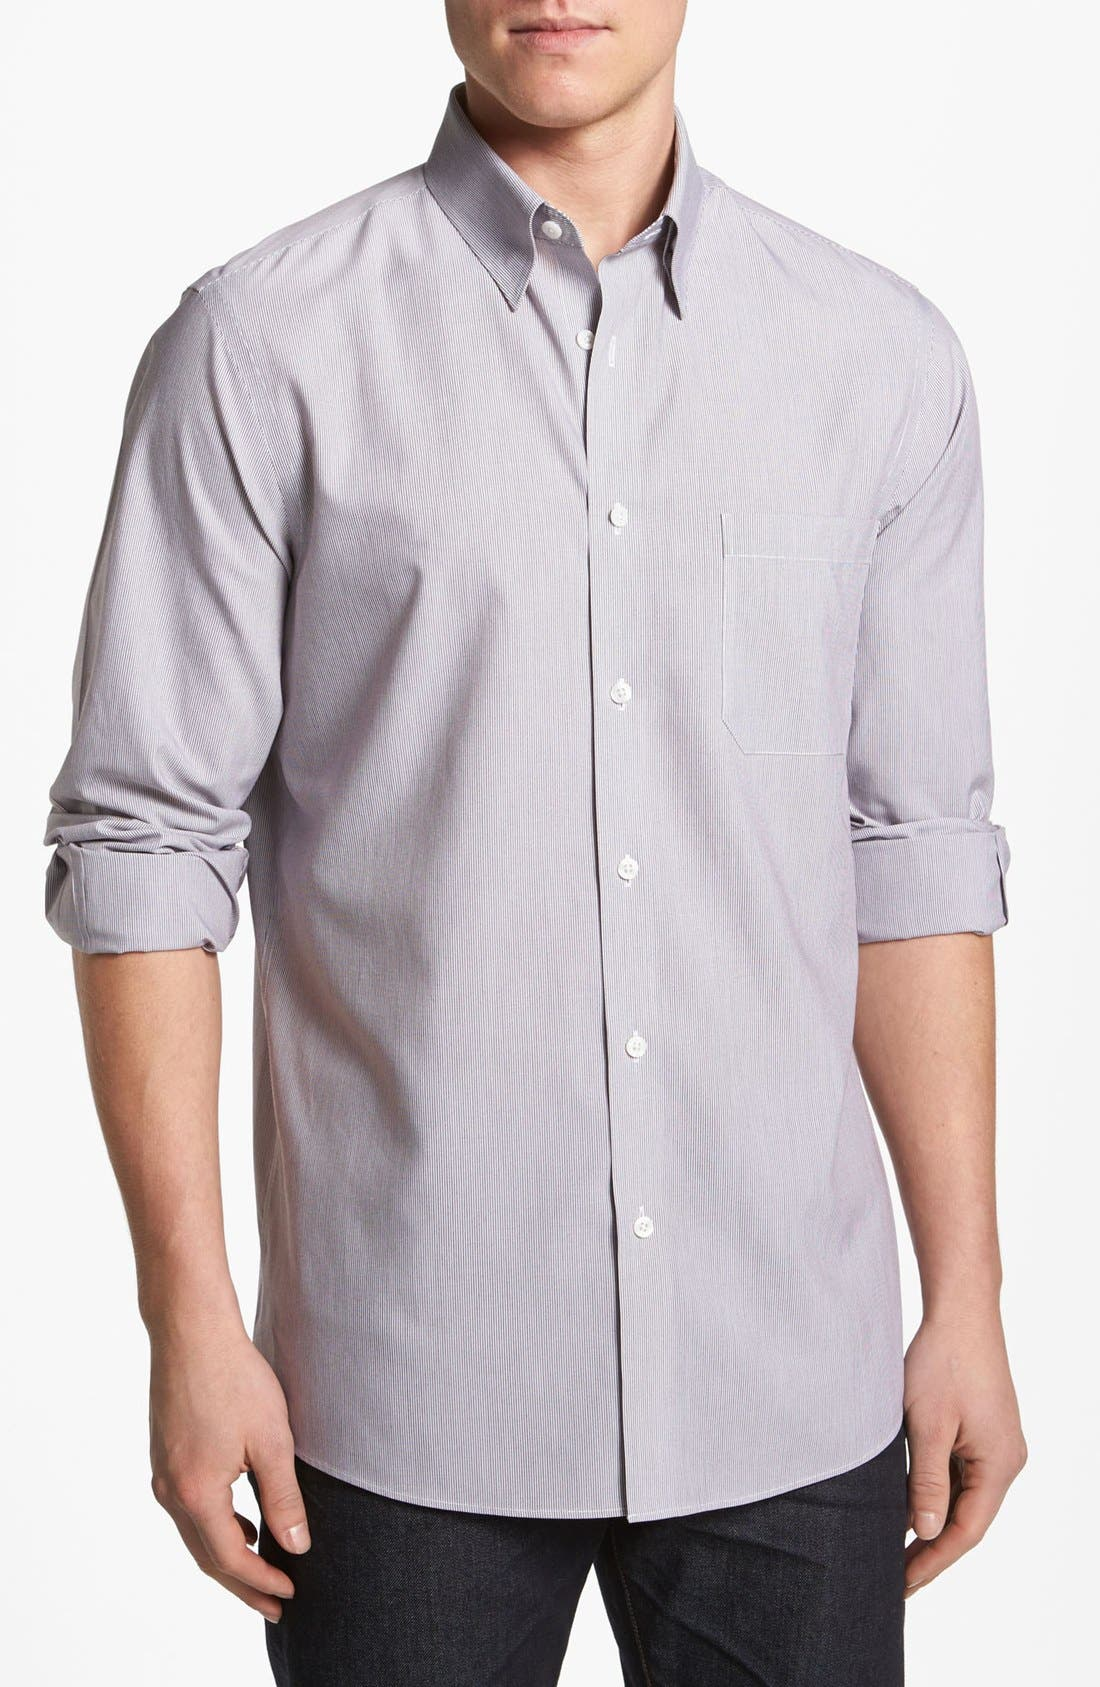 Main Image - Nordstrom Smartcare™ Striped Poplin Sport Shirt